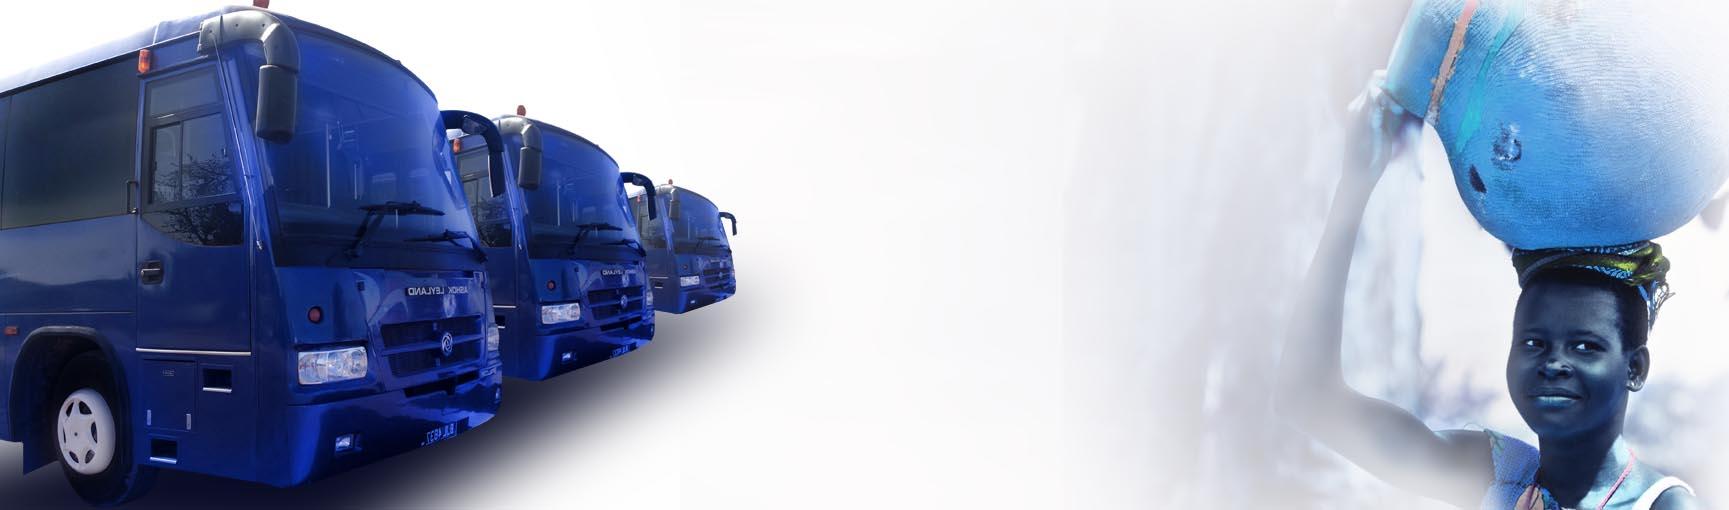 gGTSC-BLUE-BUSES-new-b